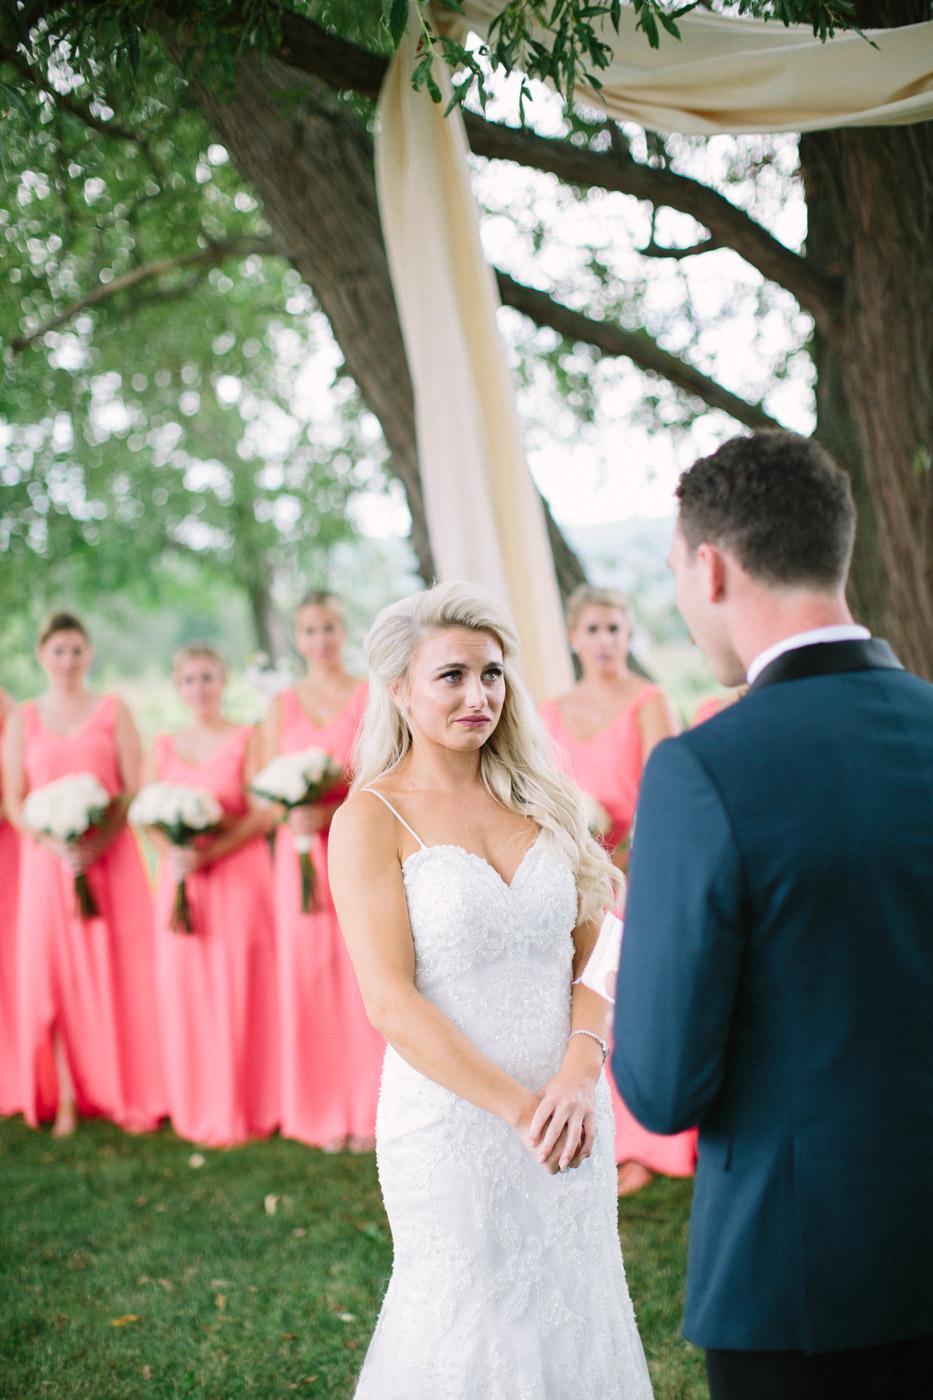 Backyard_collingwood_waterfront_diy_wedding-354.jpg